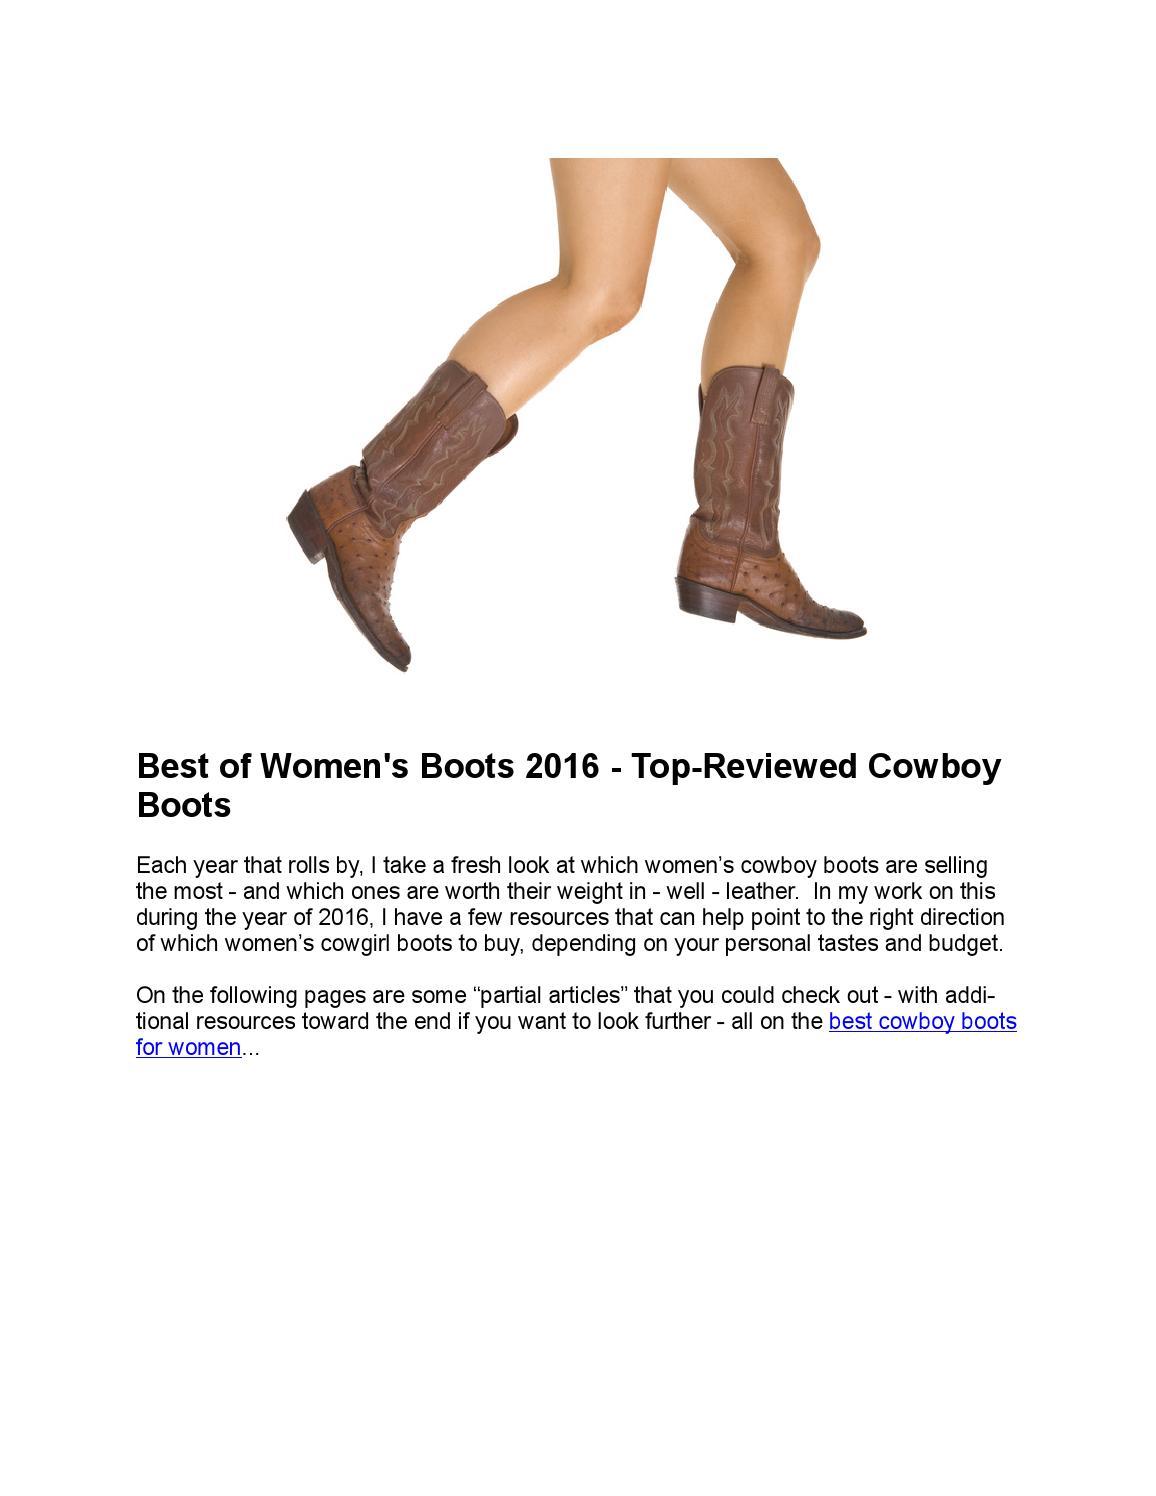 Best of Women's Boots 2016 - Top-Reviewed Cowboy Boots